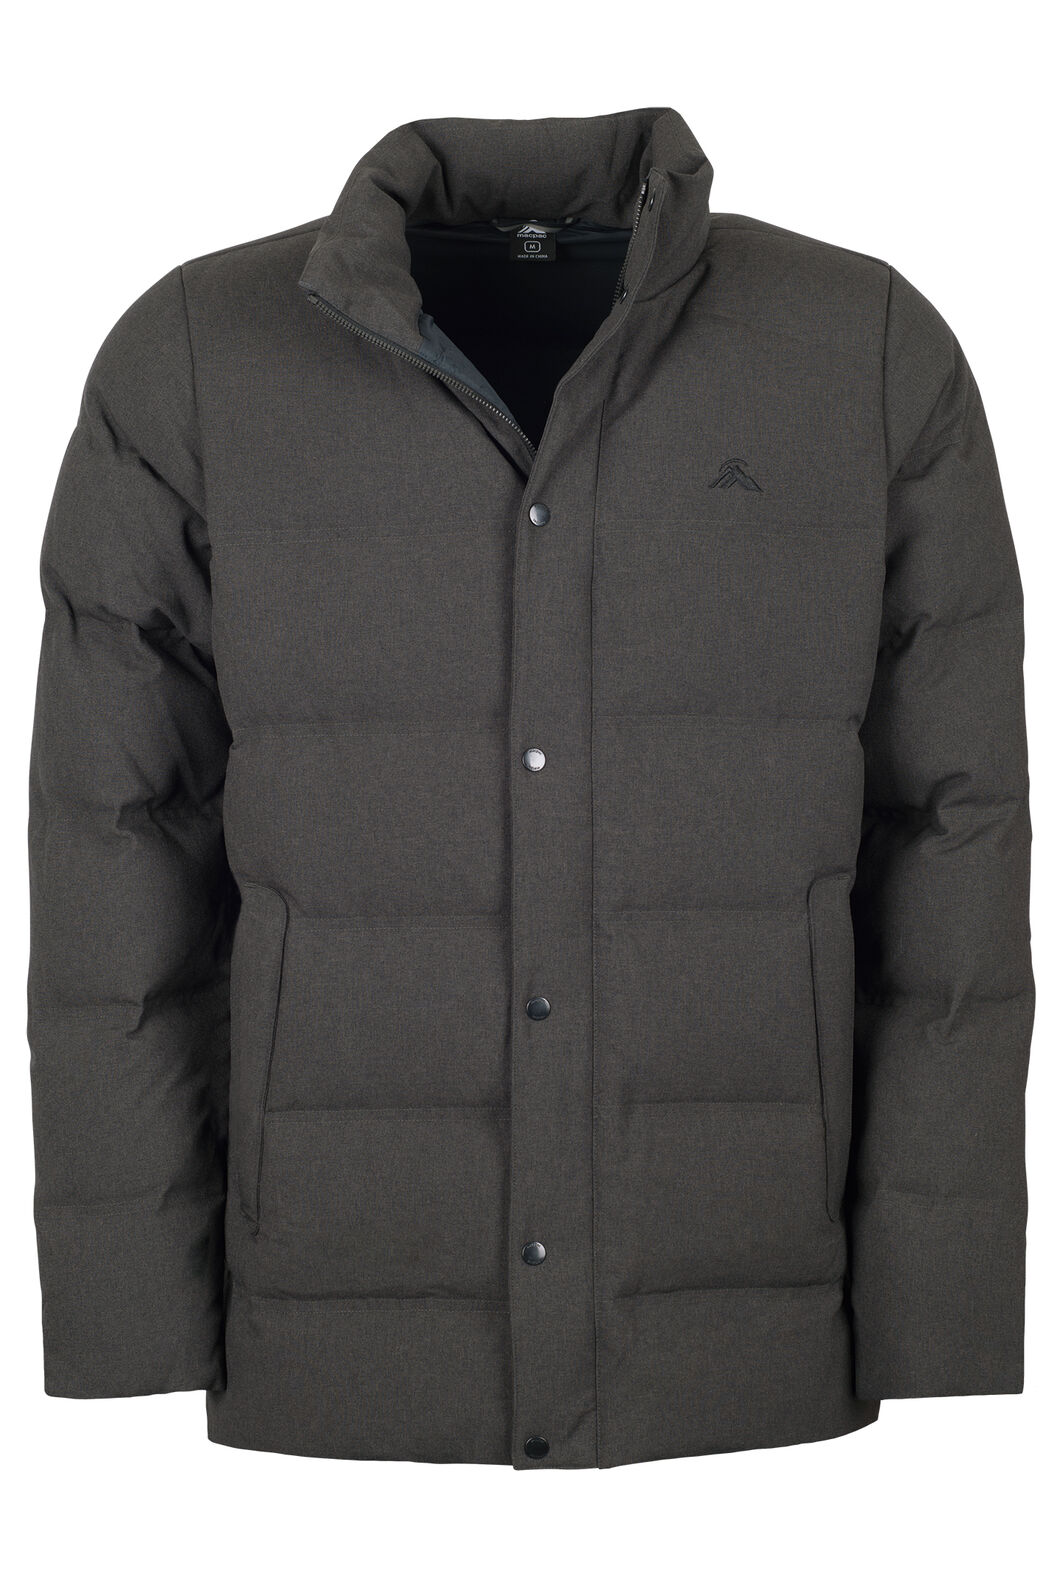 Macpac Meridian Down Jacket - Men's, Charcoal Marle, hi-res